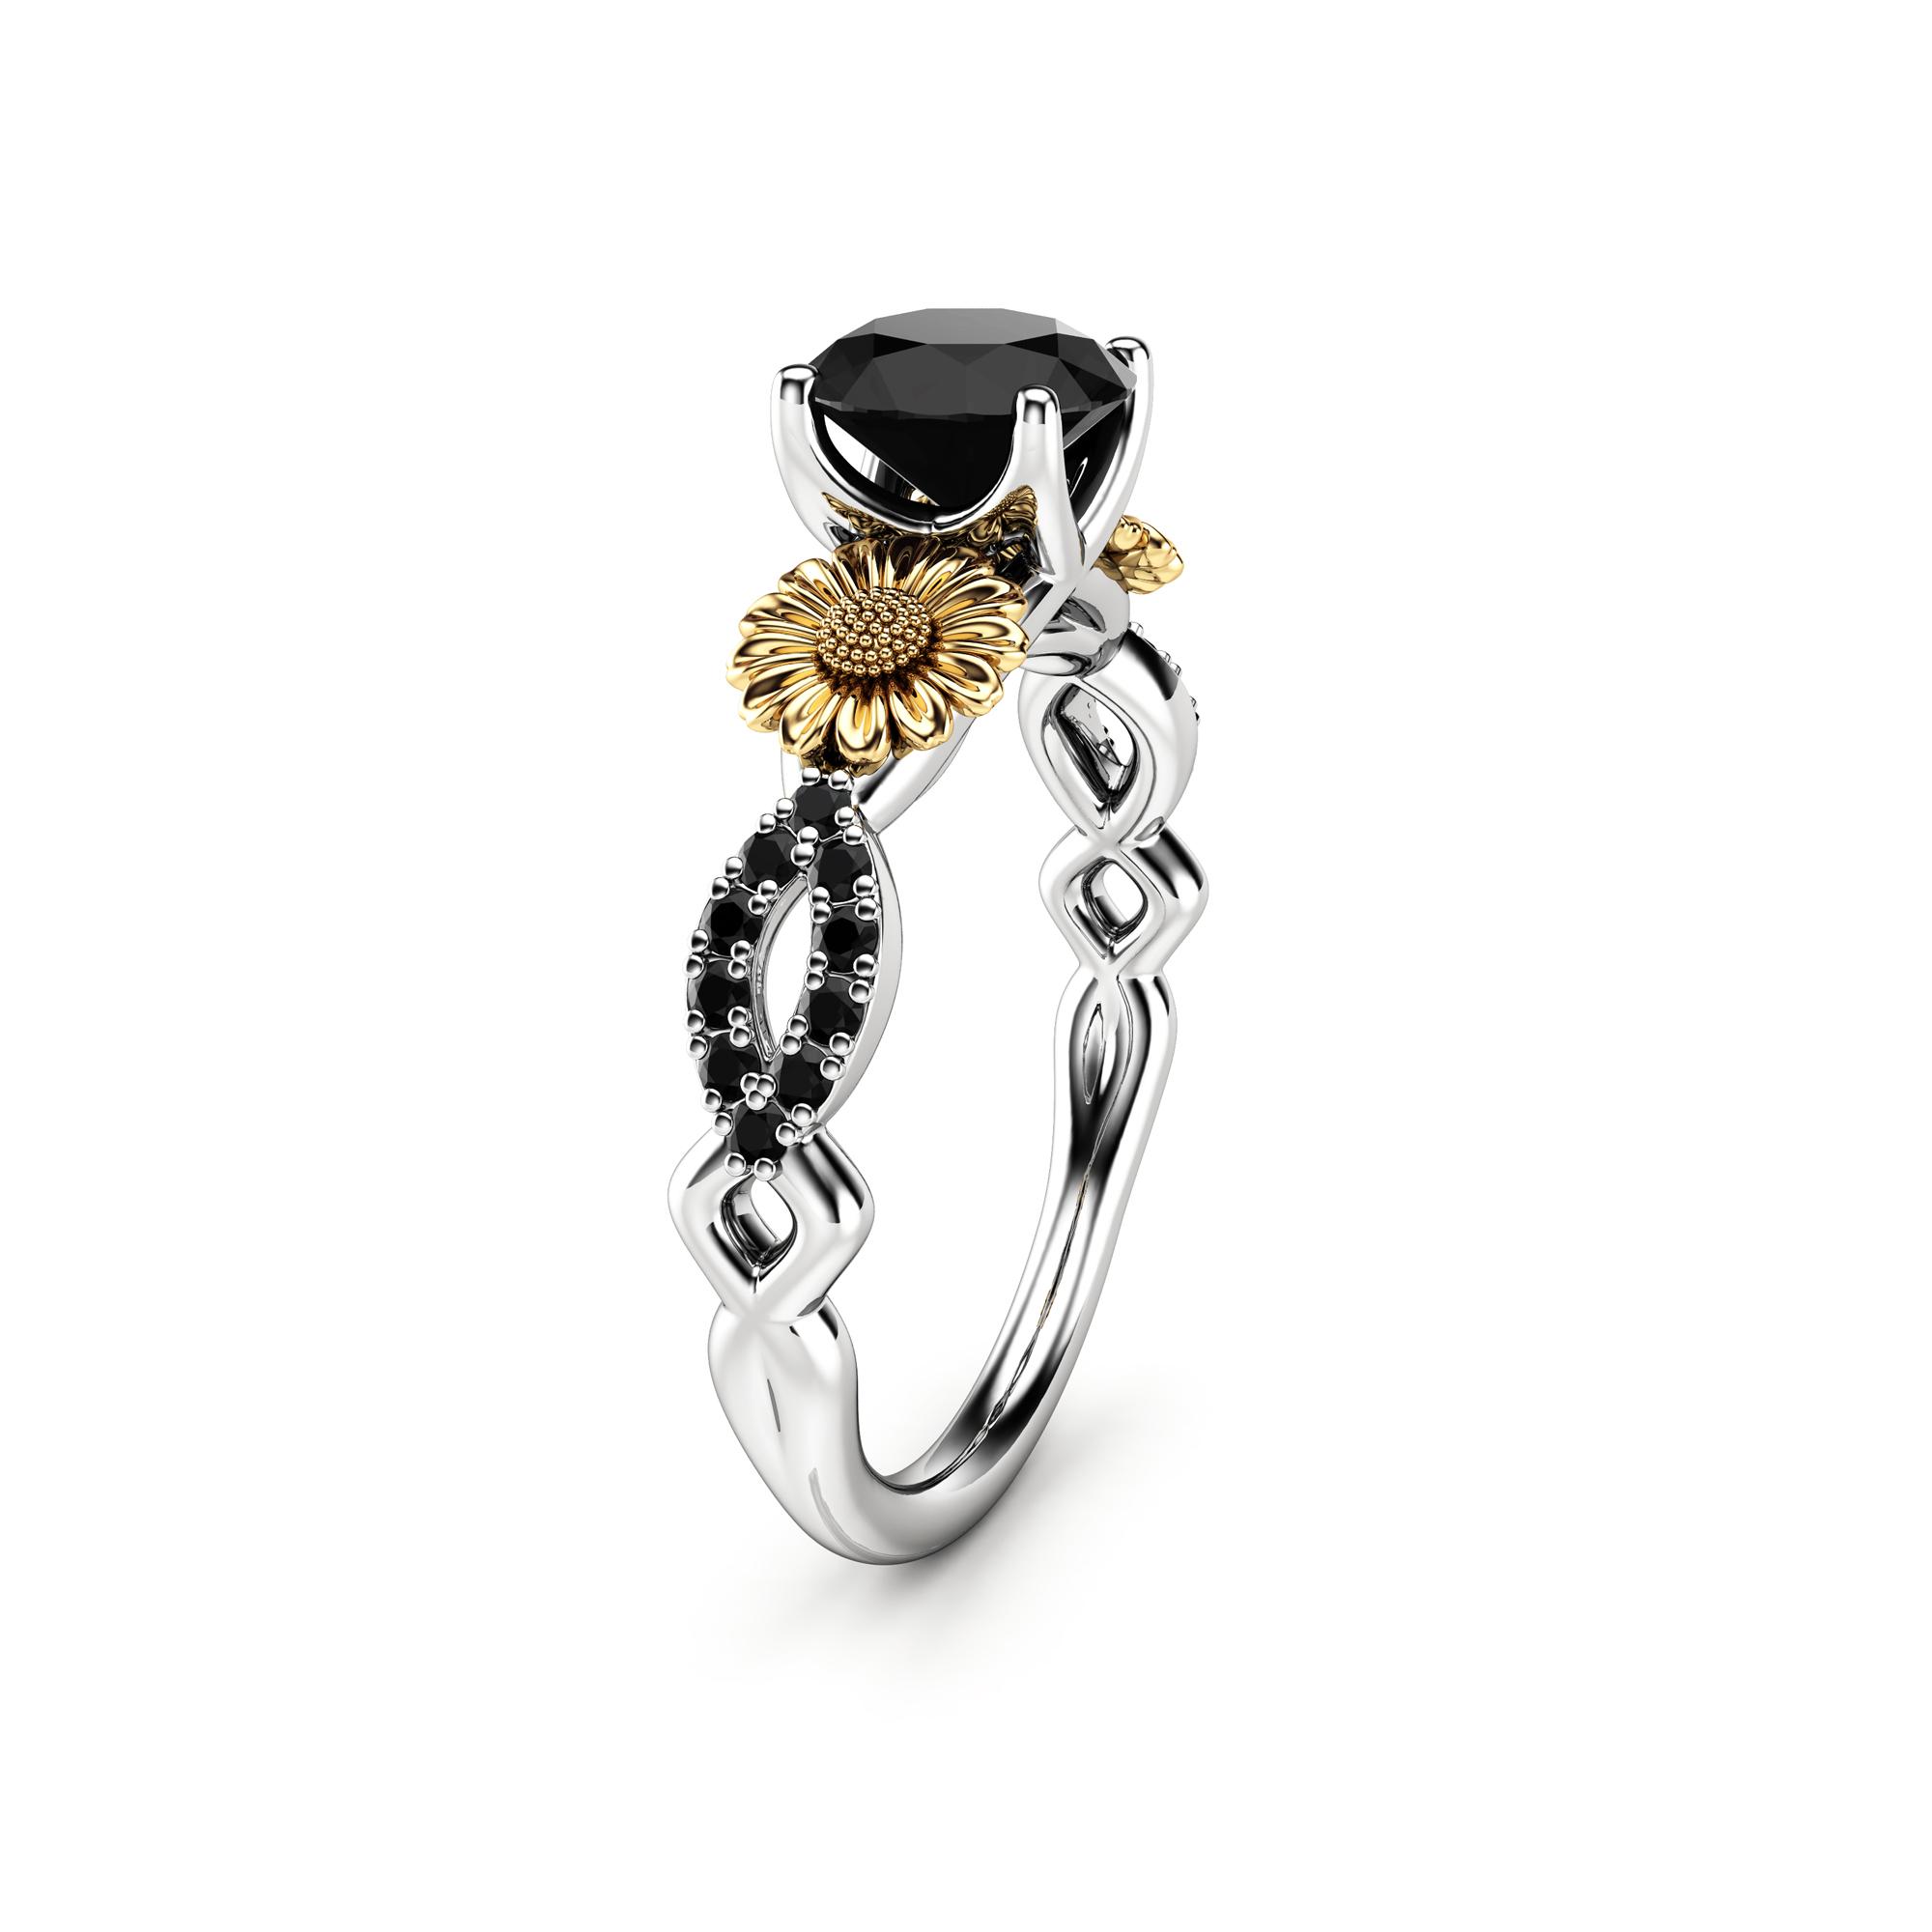 Natural Black Diamond In 14k Gold Sunflower Engagement Ring Sunflower Ring For Women Unique Flower Ring Black Diamond Engagement Ring Camellia Jewelry